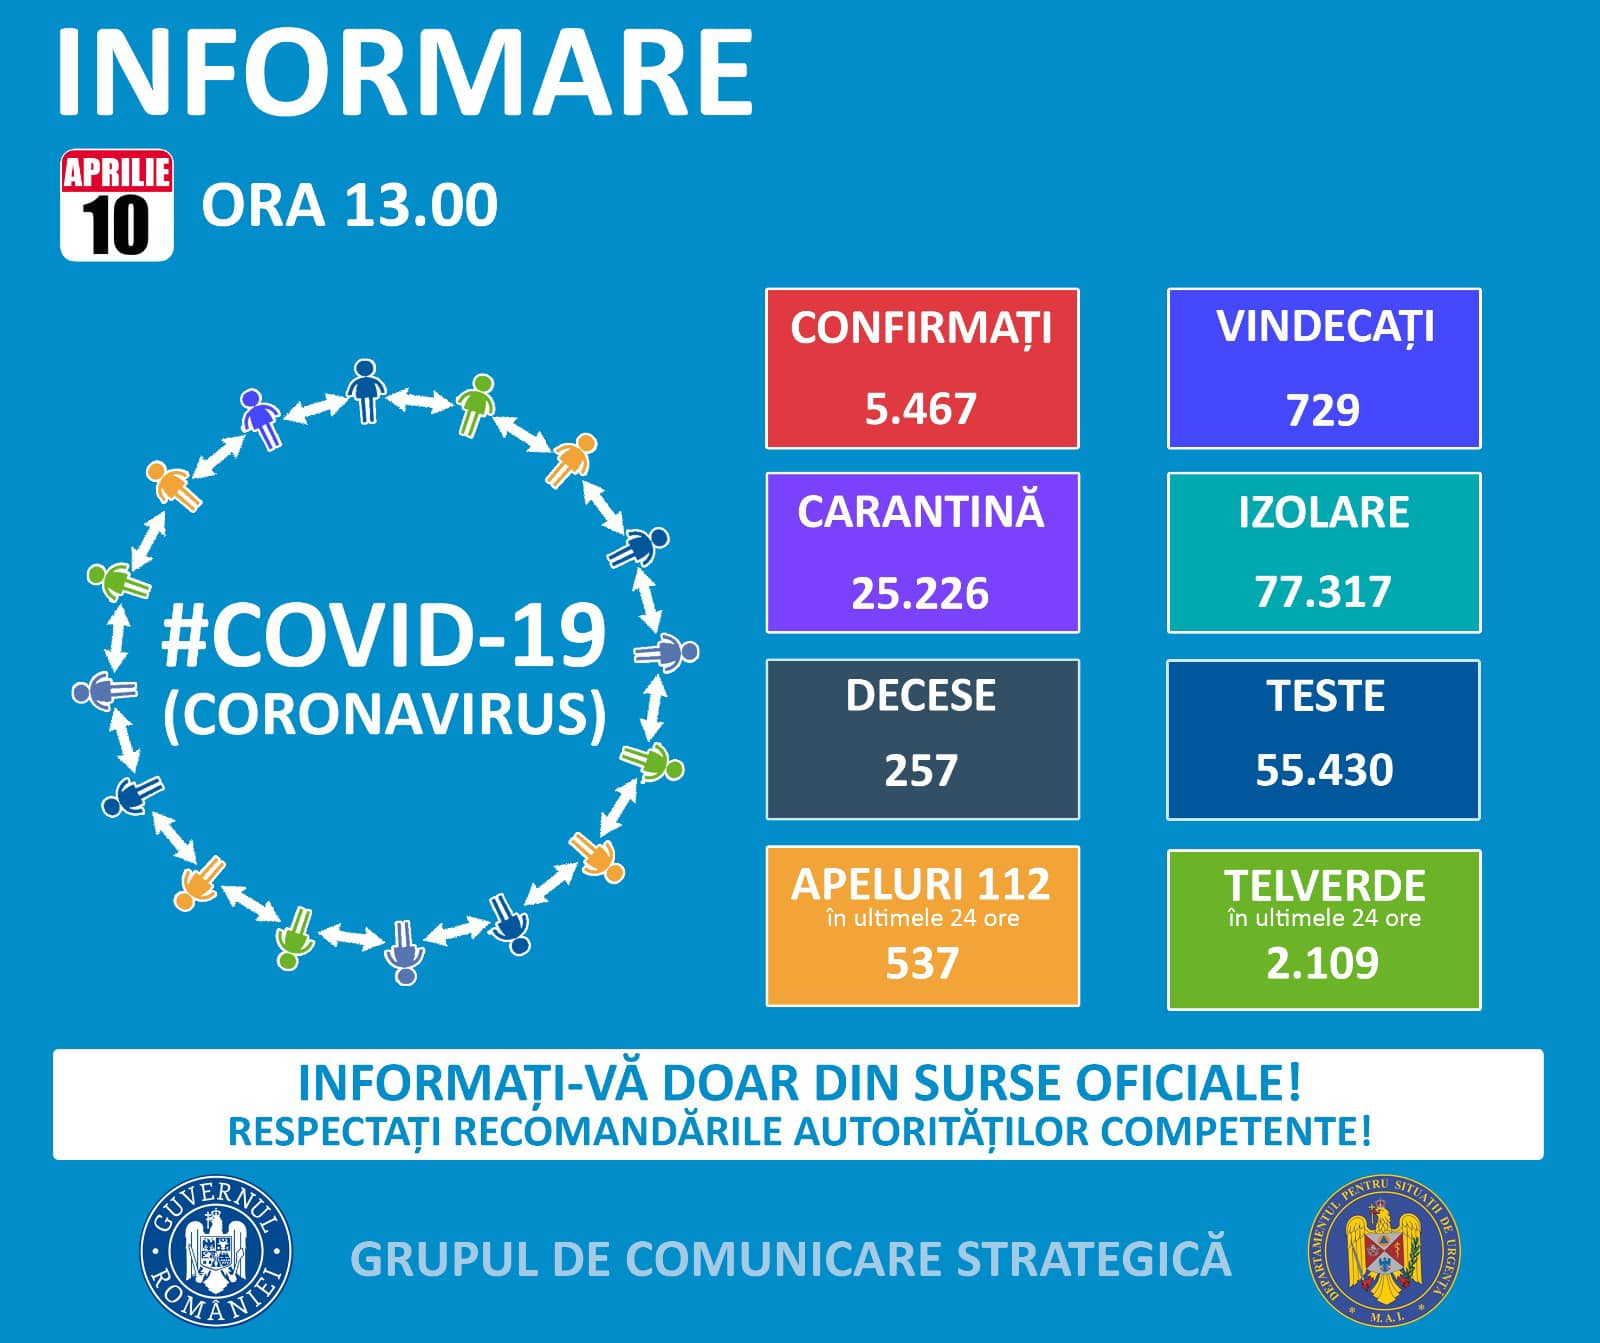 Coronavirus Romania situatie 10 aprilie 2020